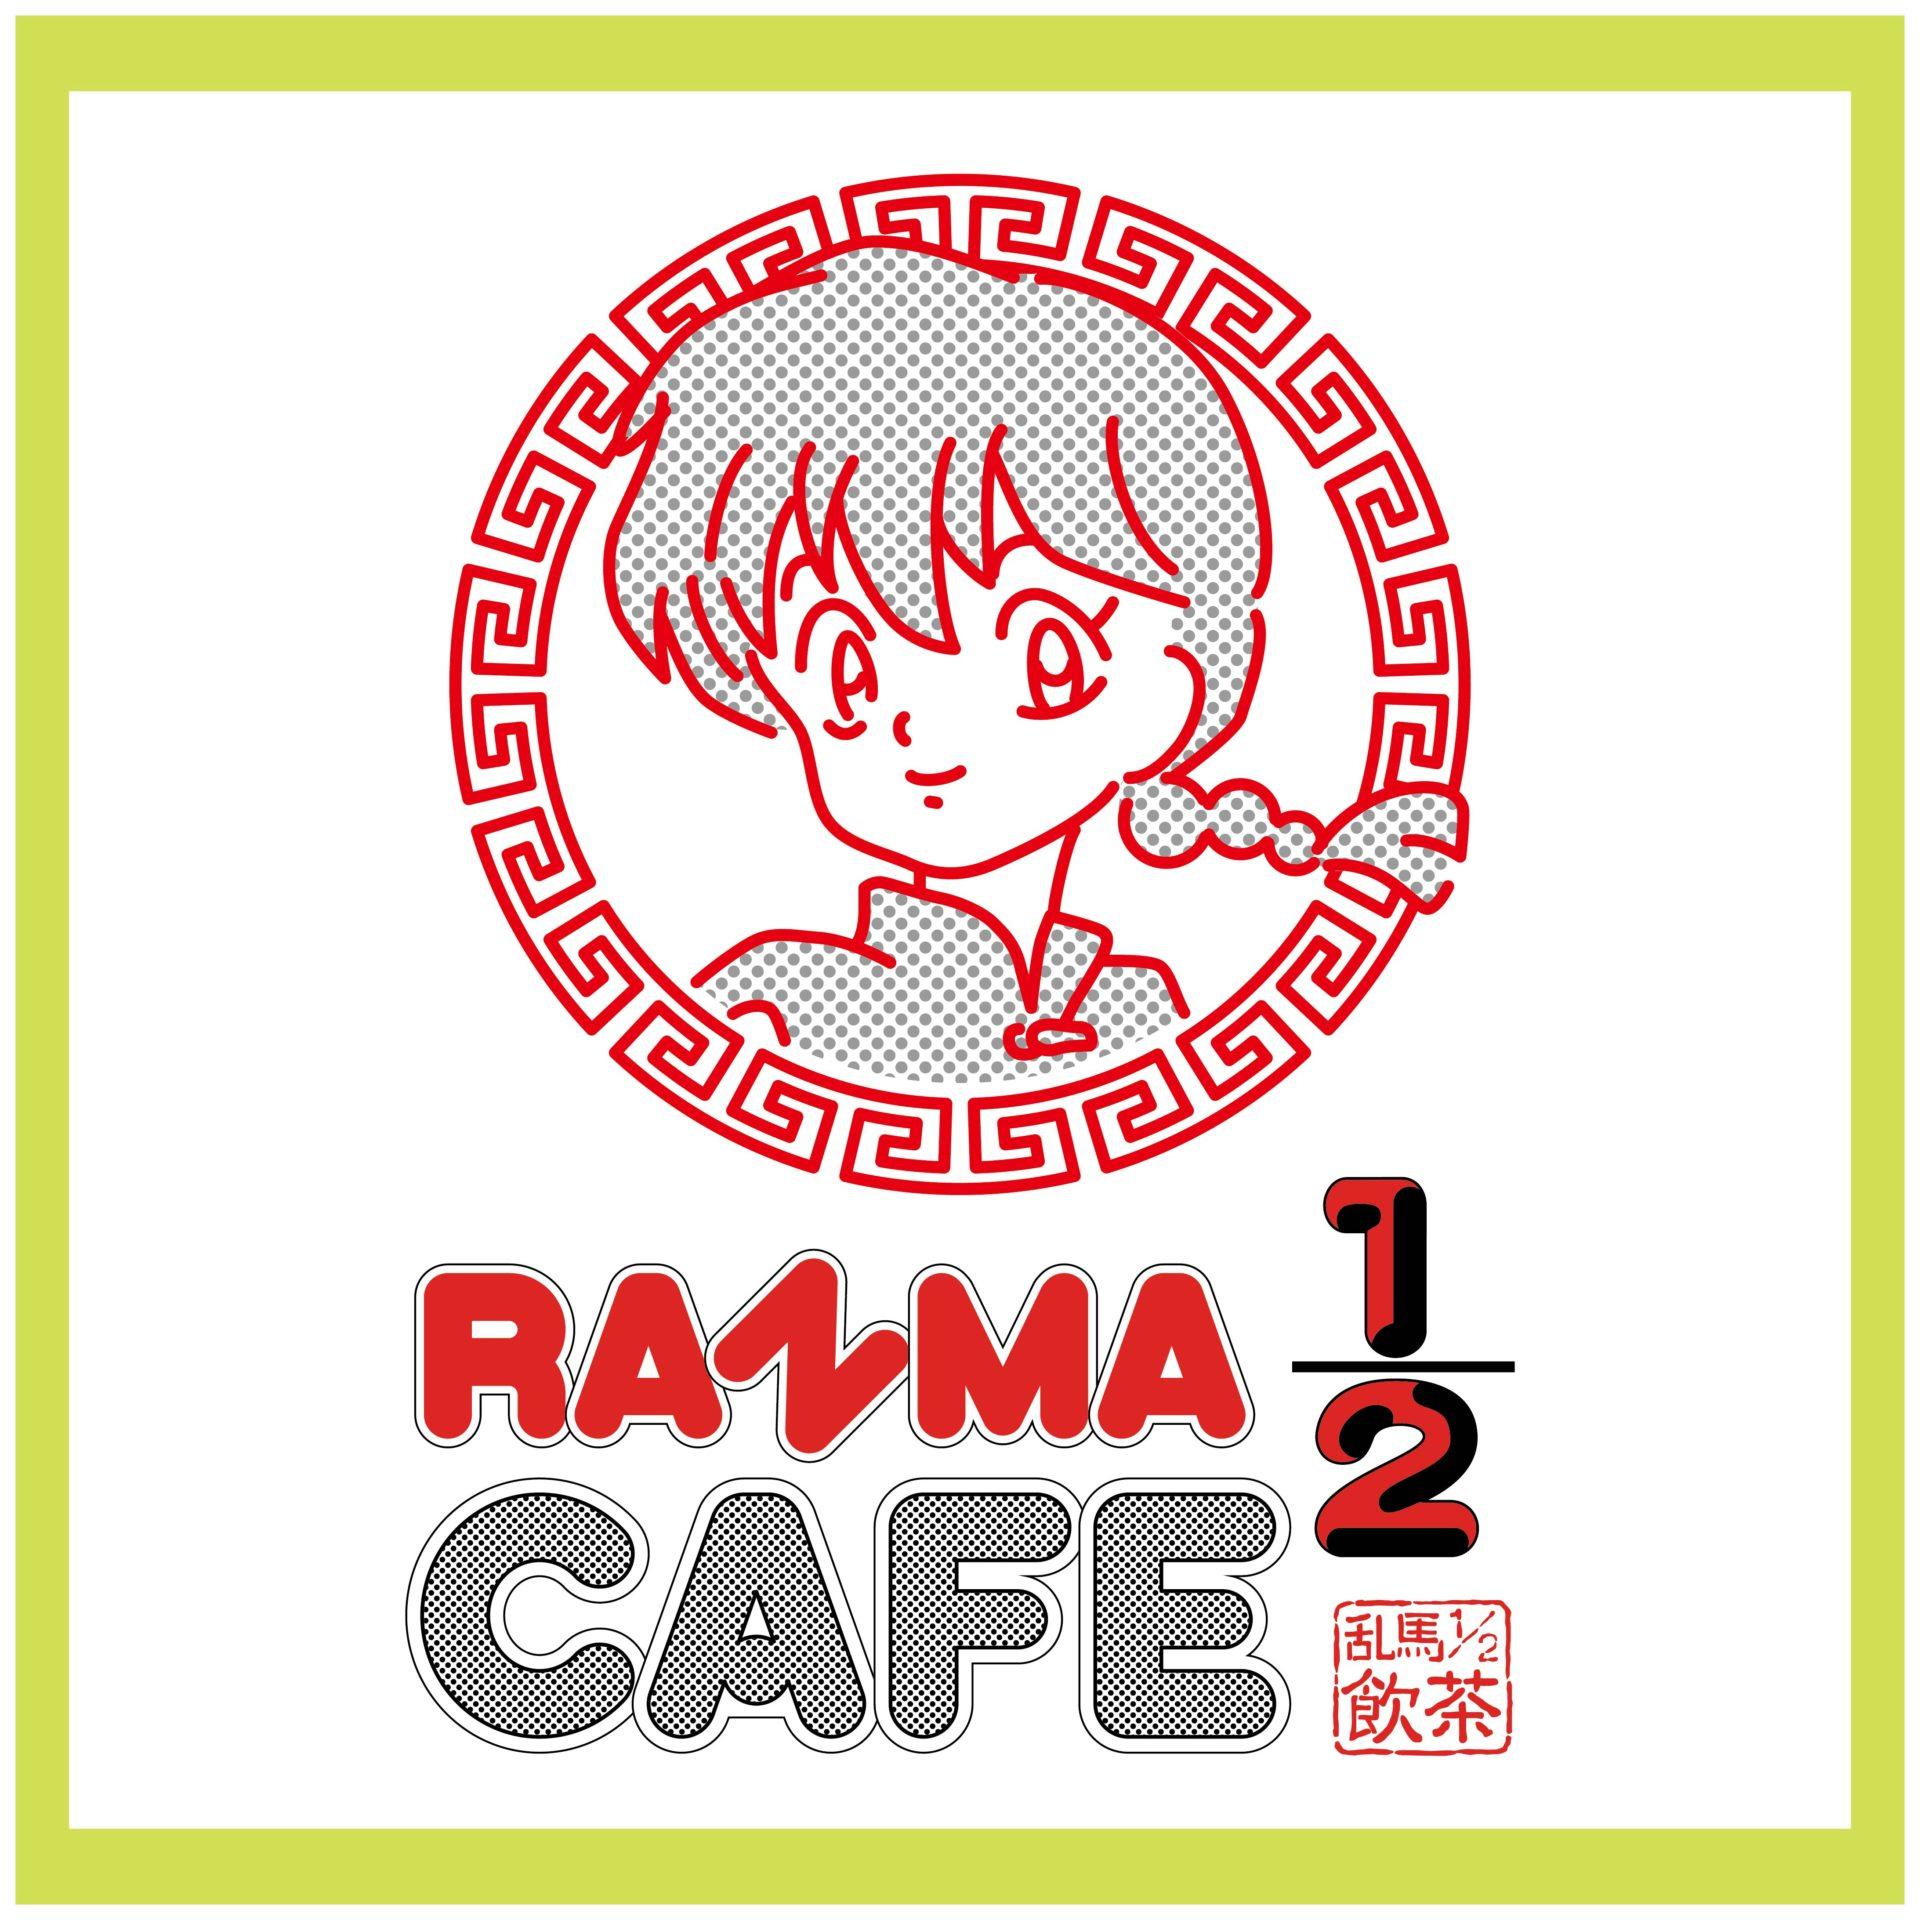 ranma_cafe-04